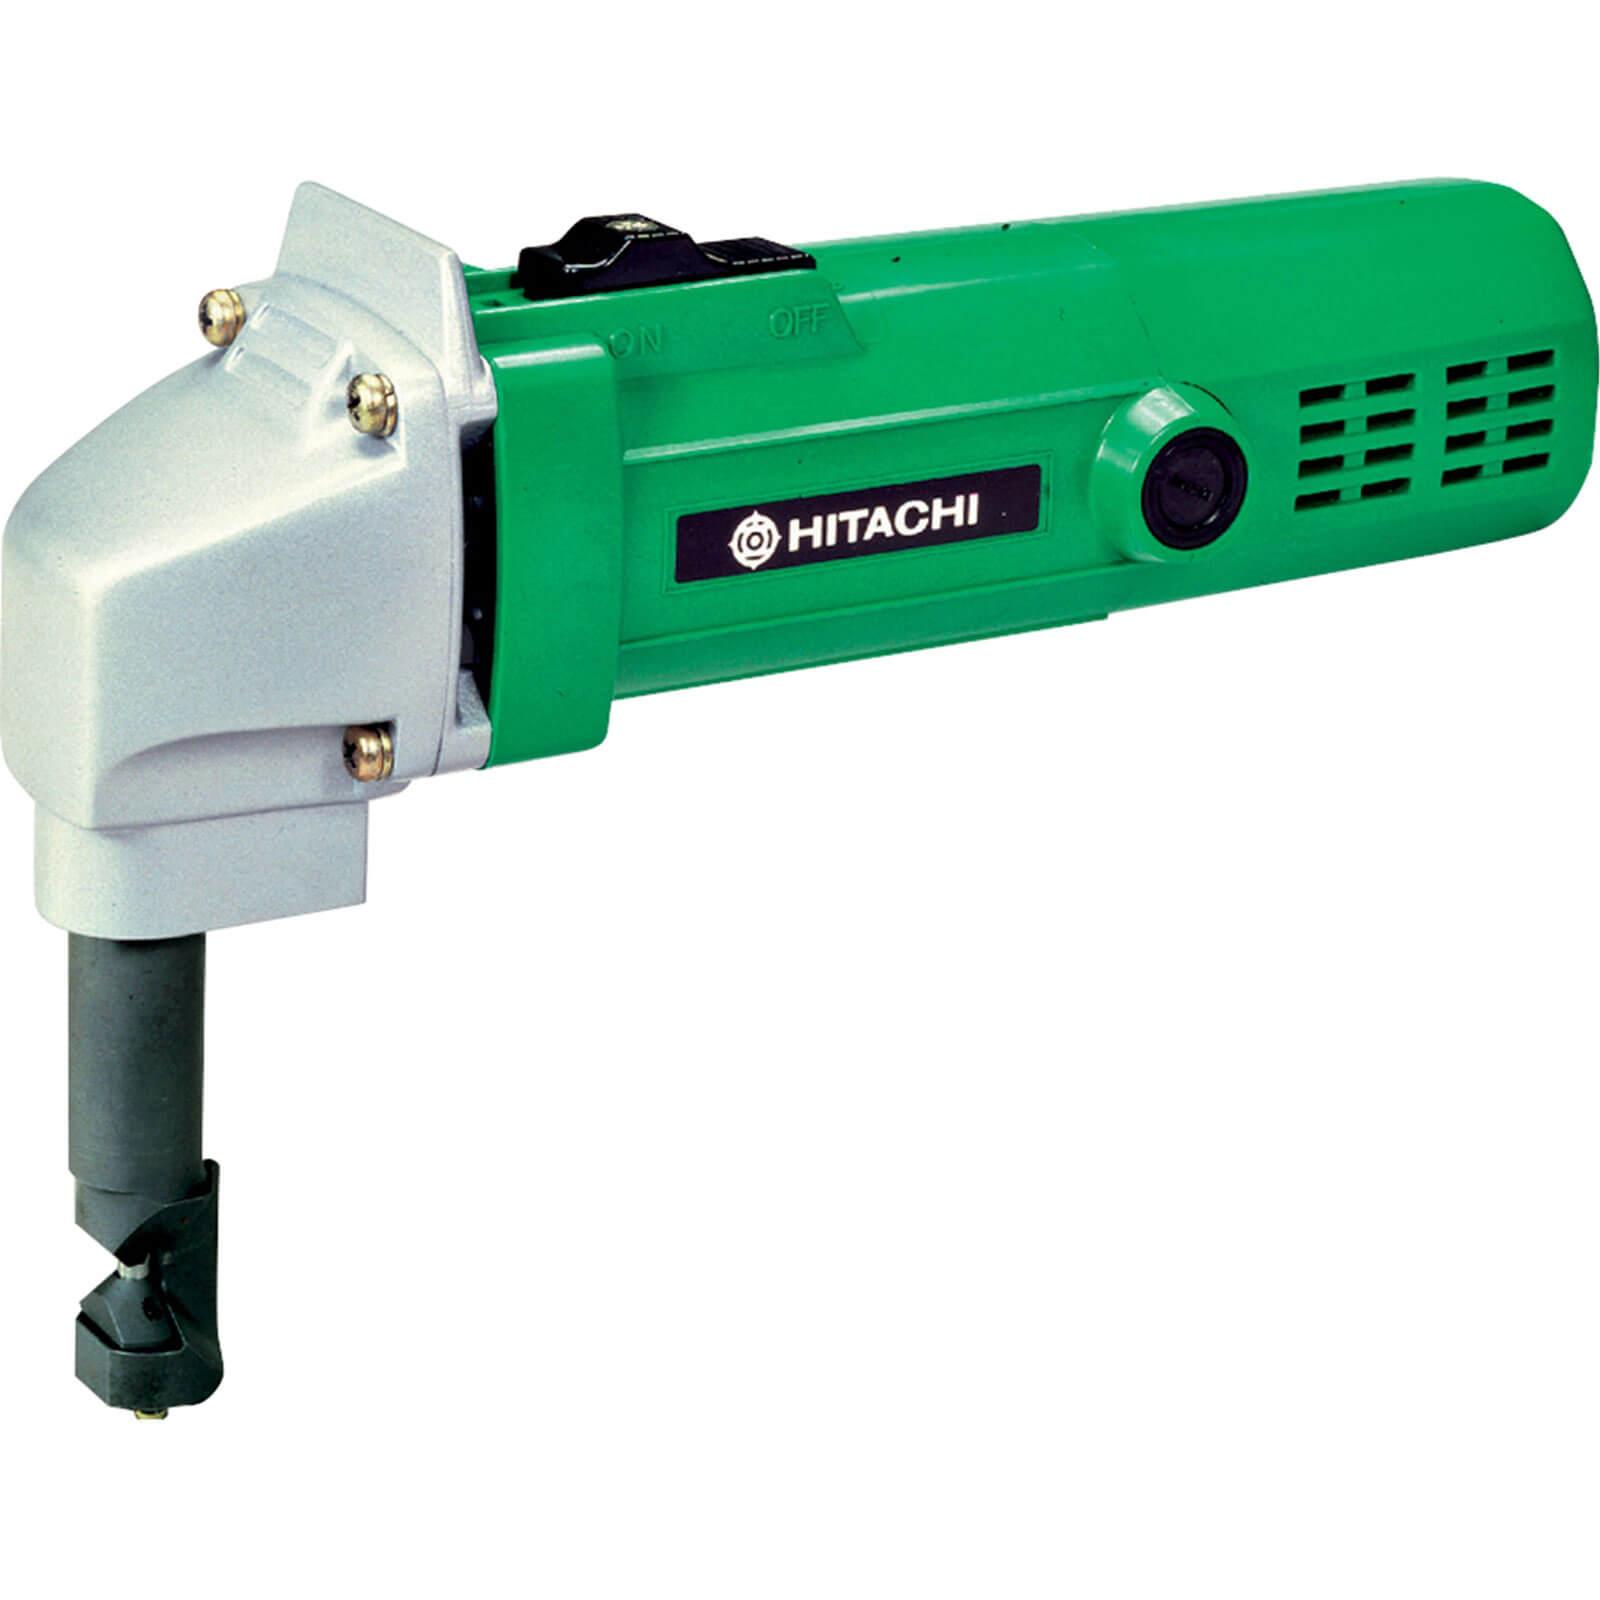 Hitachi Cn16Sa Metal Nibbler 400w 110v